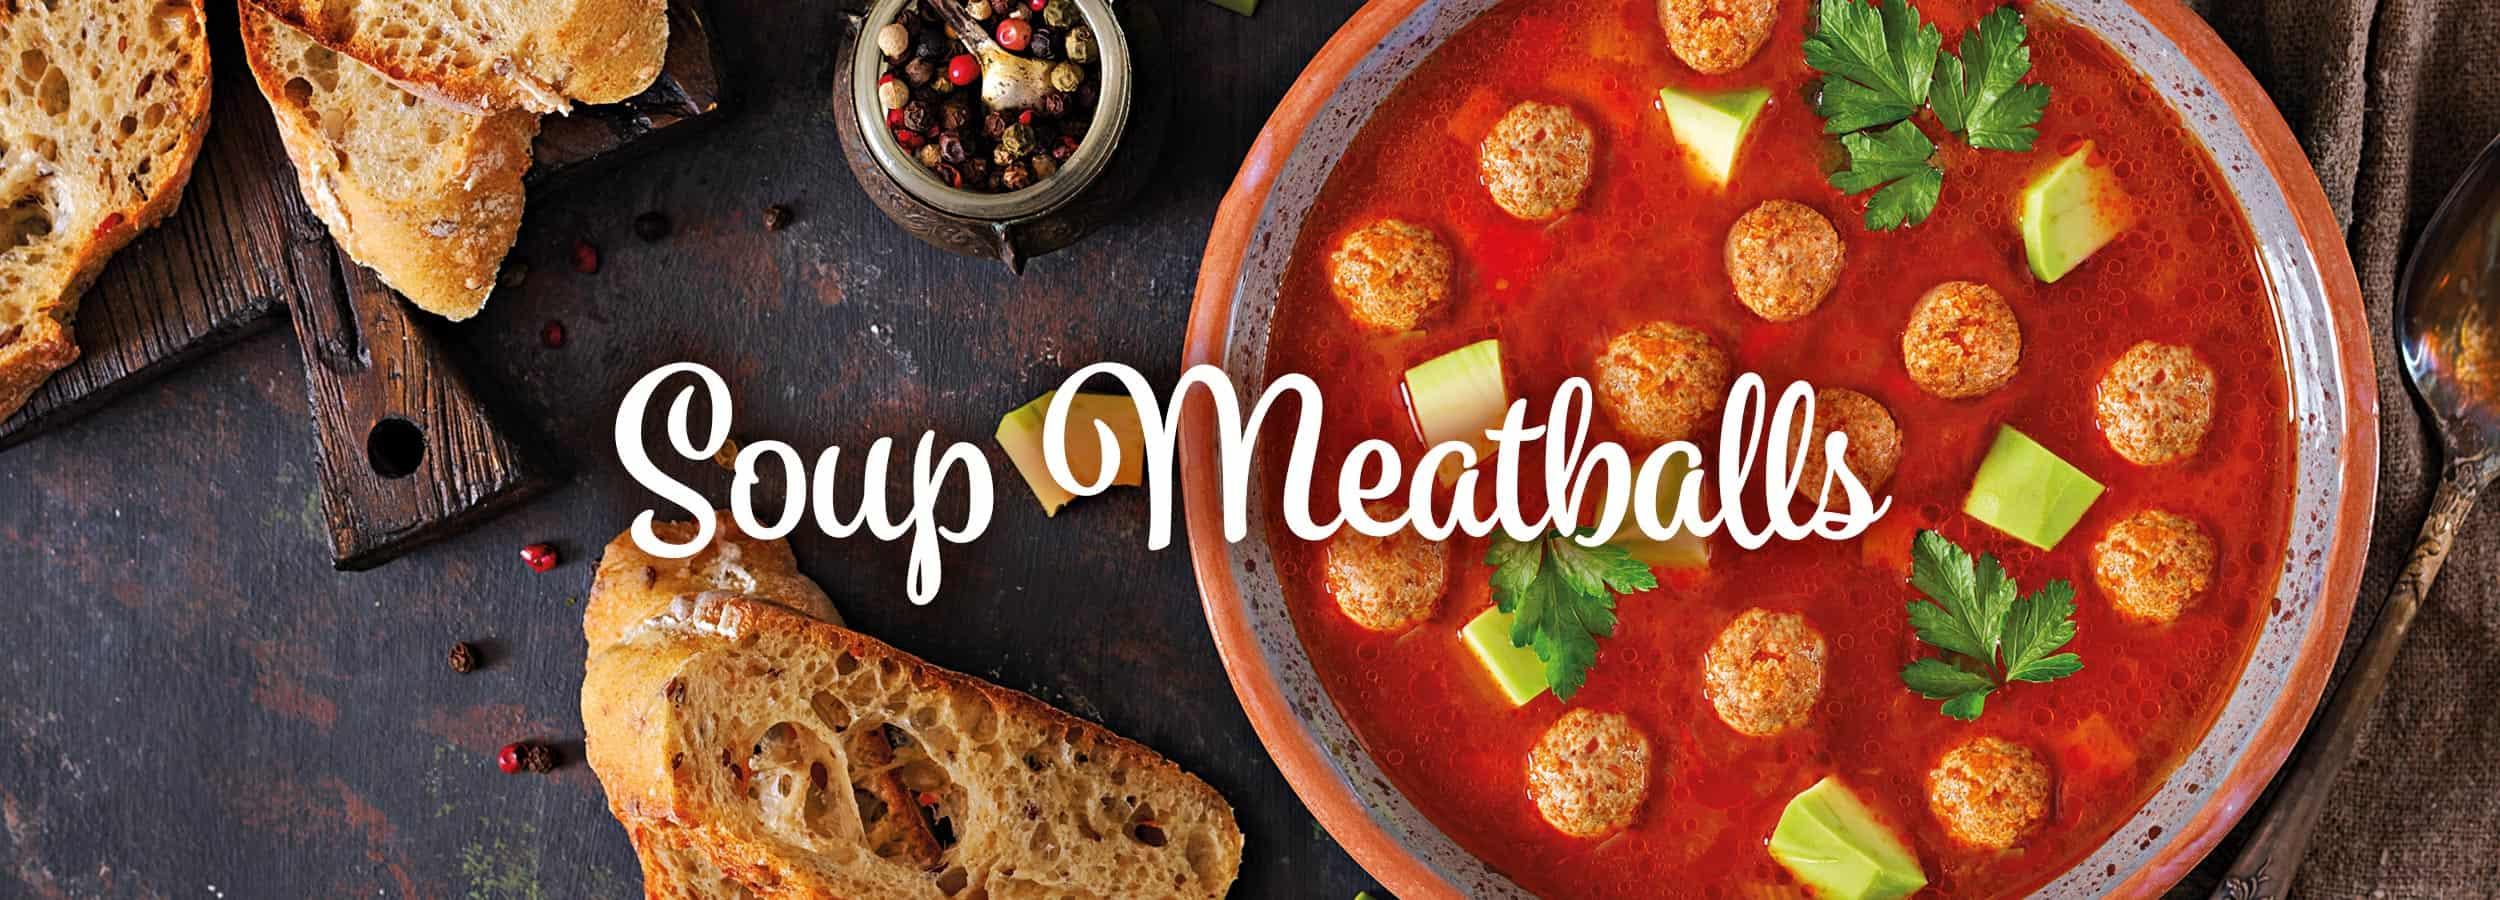 New ELV Soup Meatballs